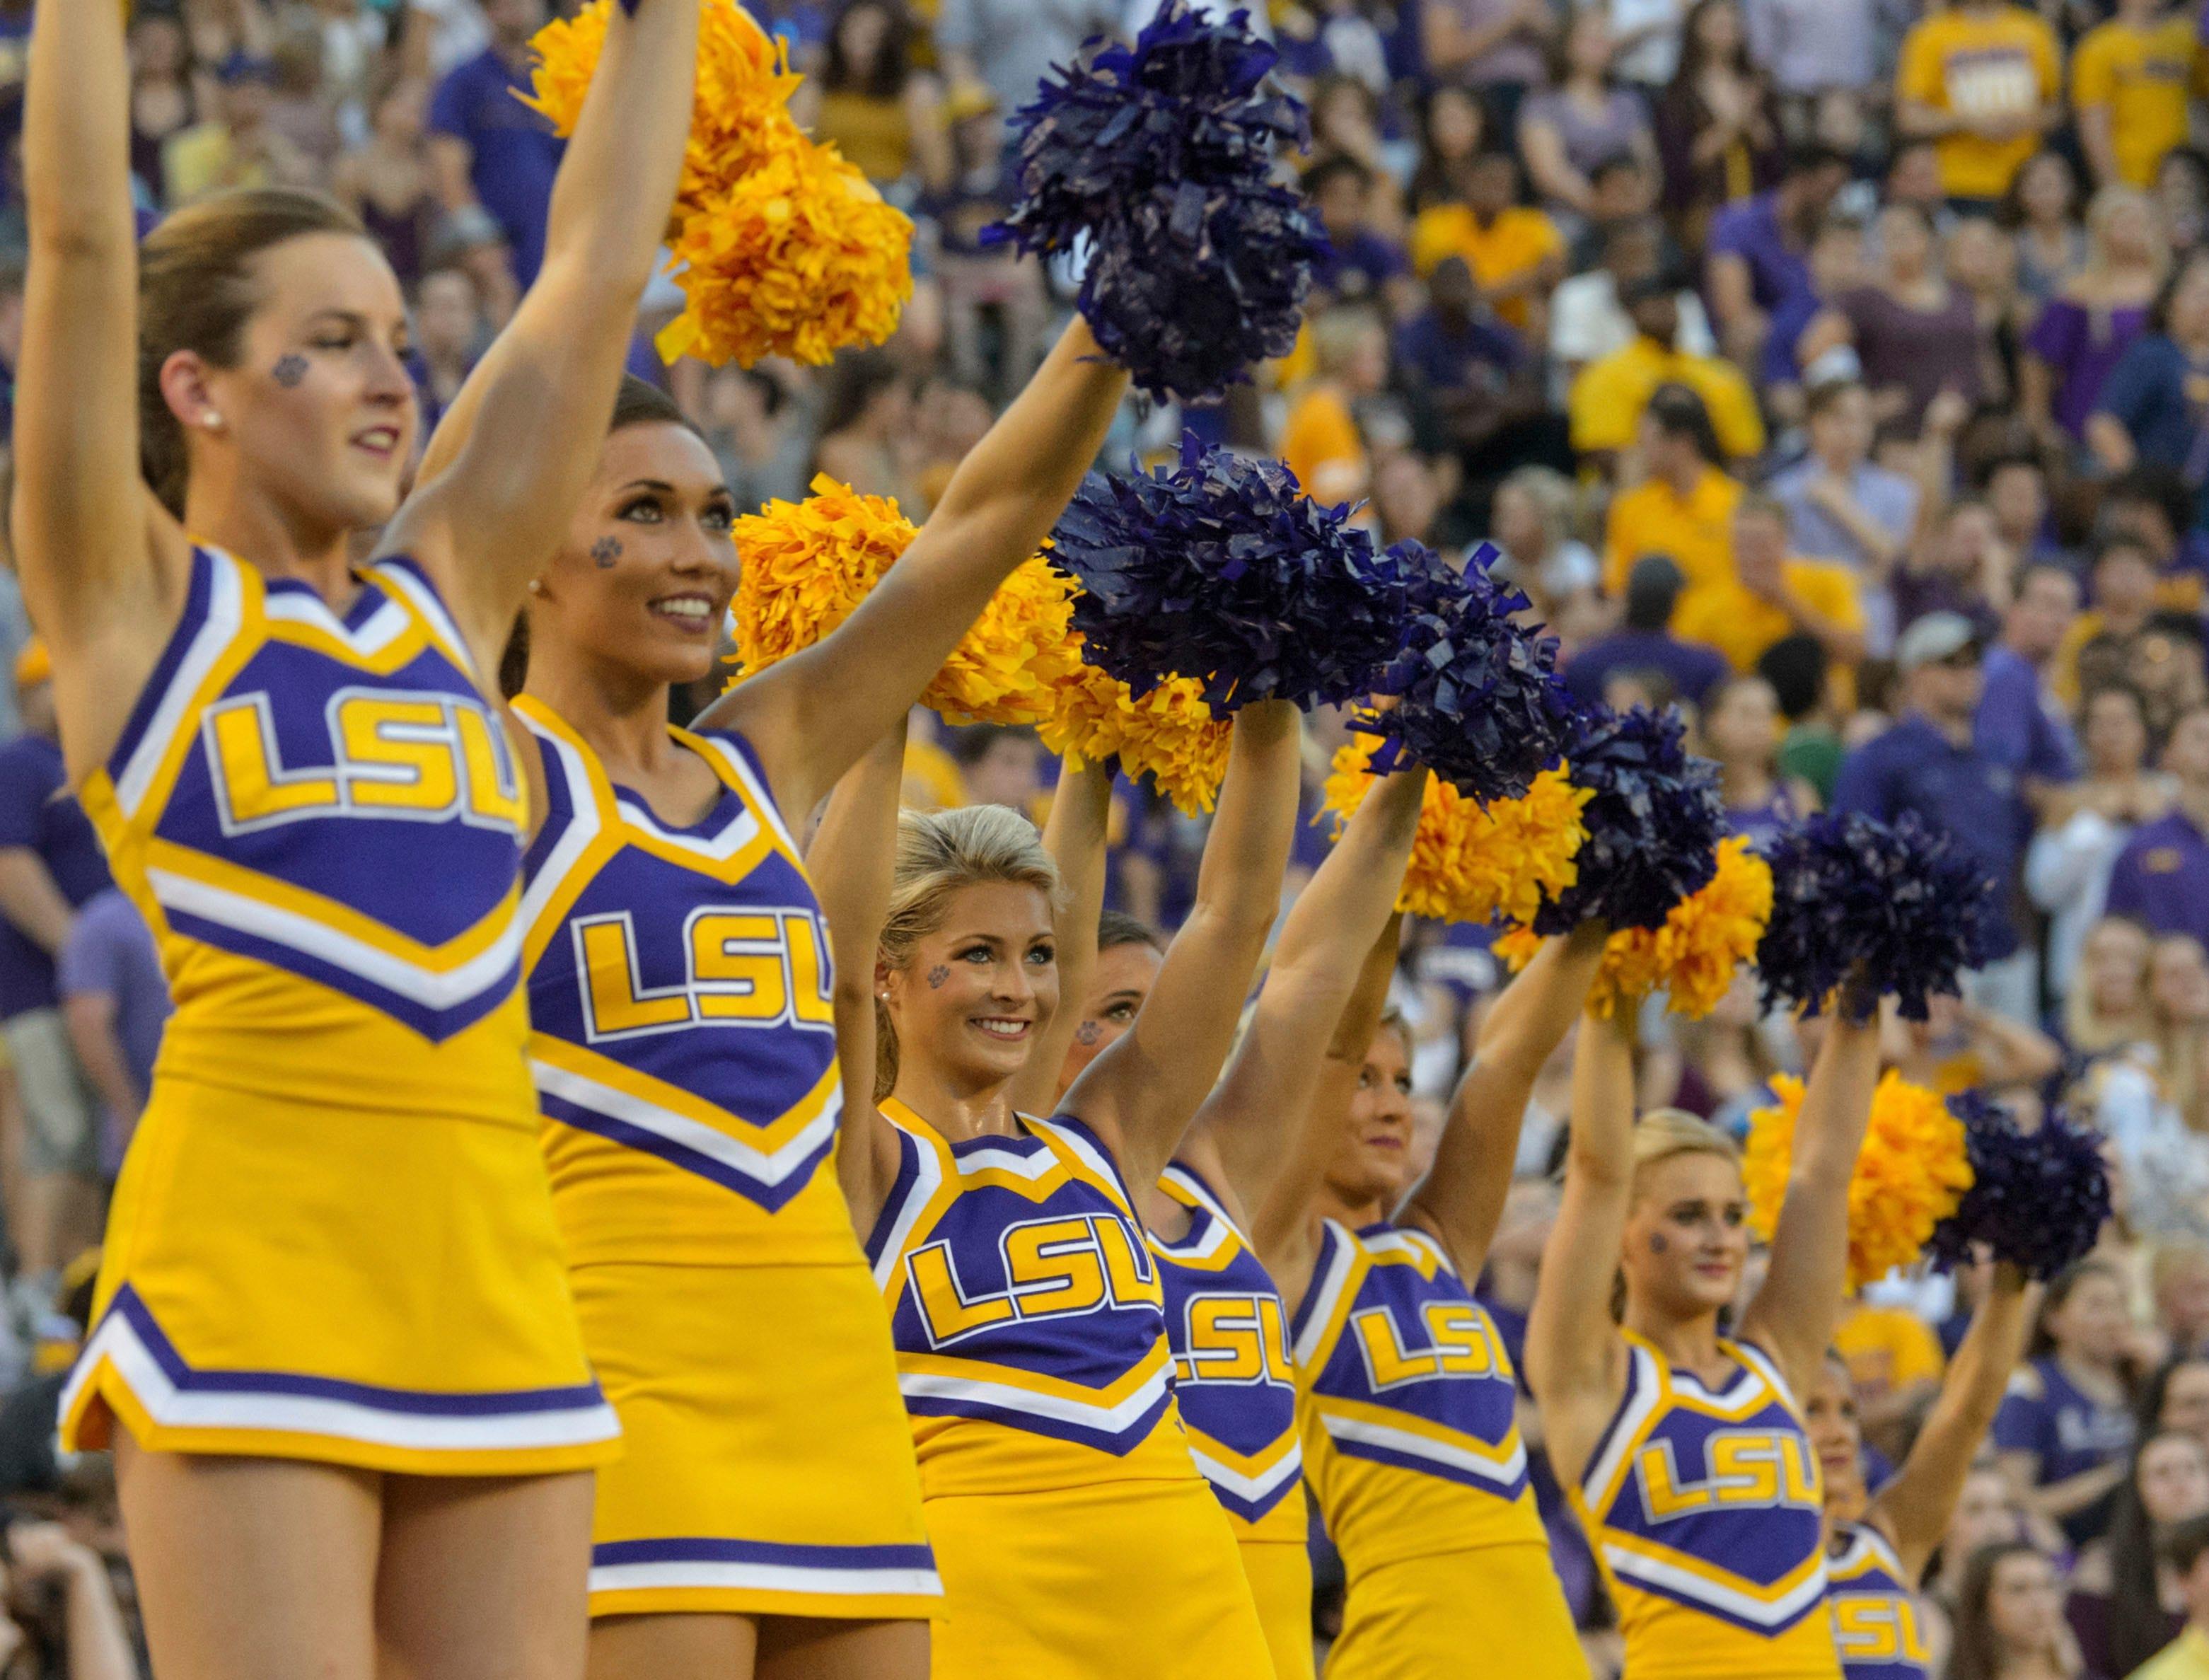 LSU cheerleaders perform against Syracuse in an NCAA college football game in Baton Rouge, La., Saturday, Sept. 23, 2017. (AP Photo/Matthew Hinton)